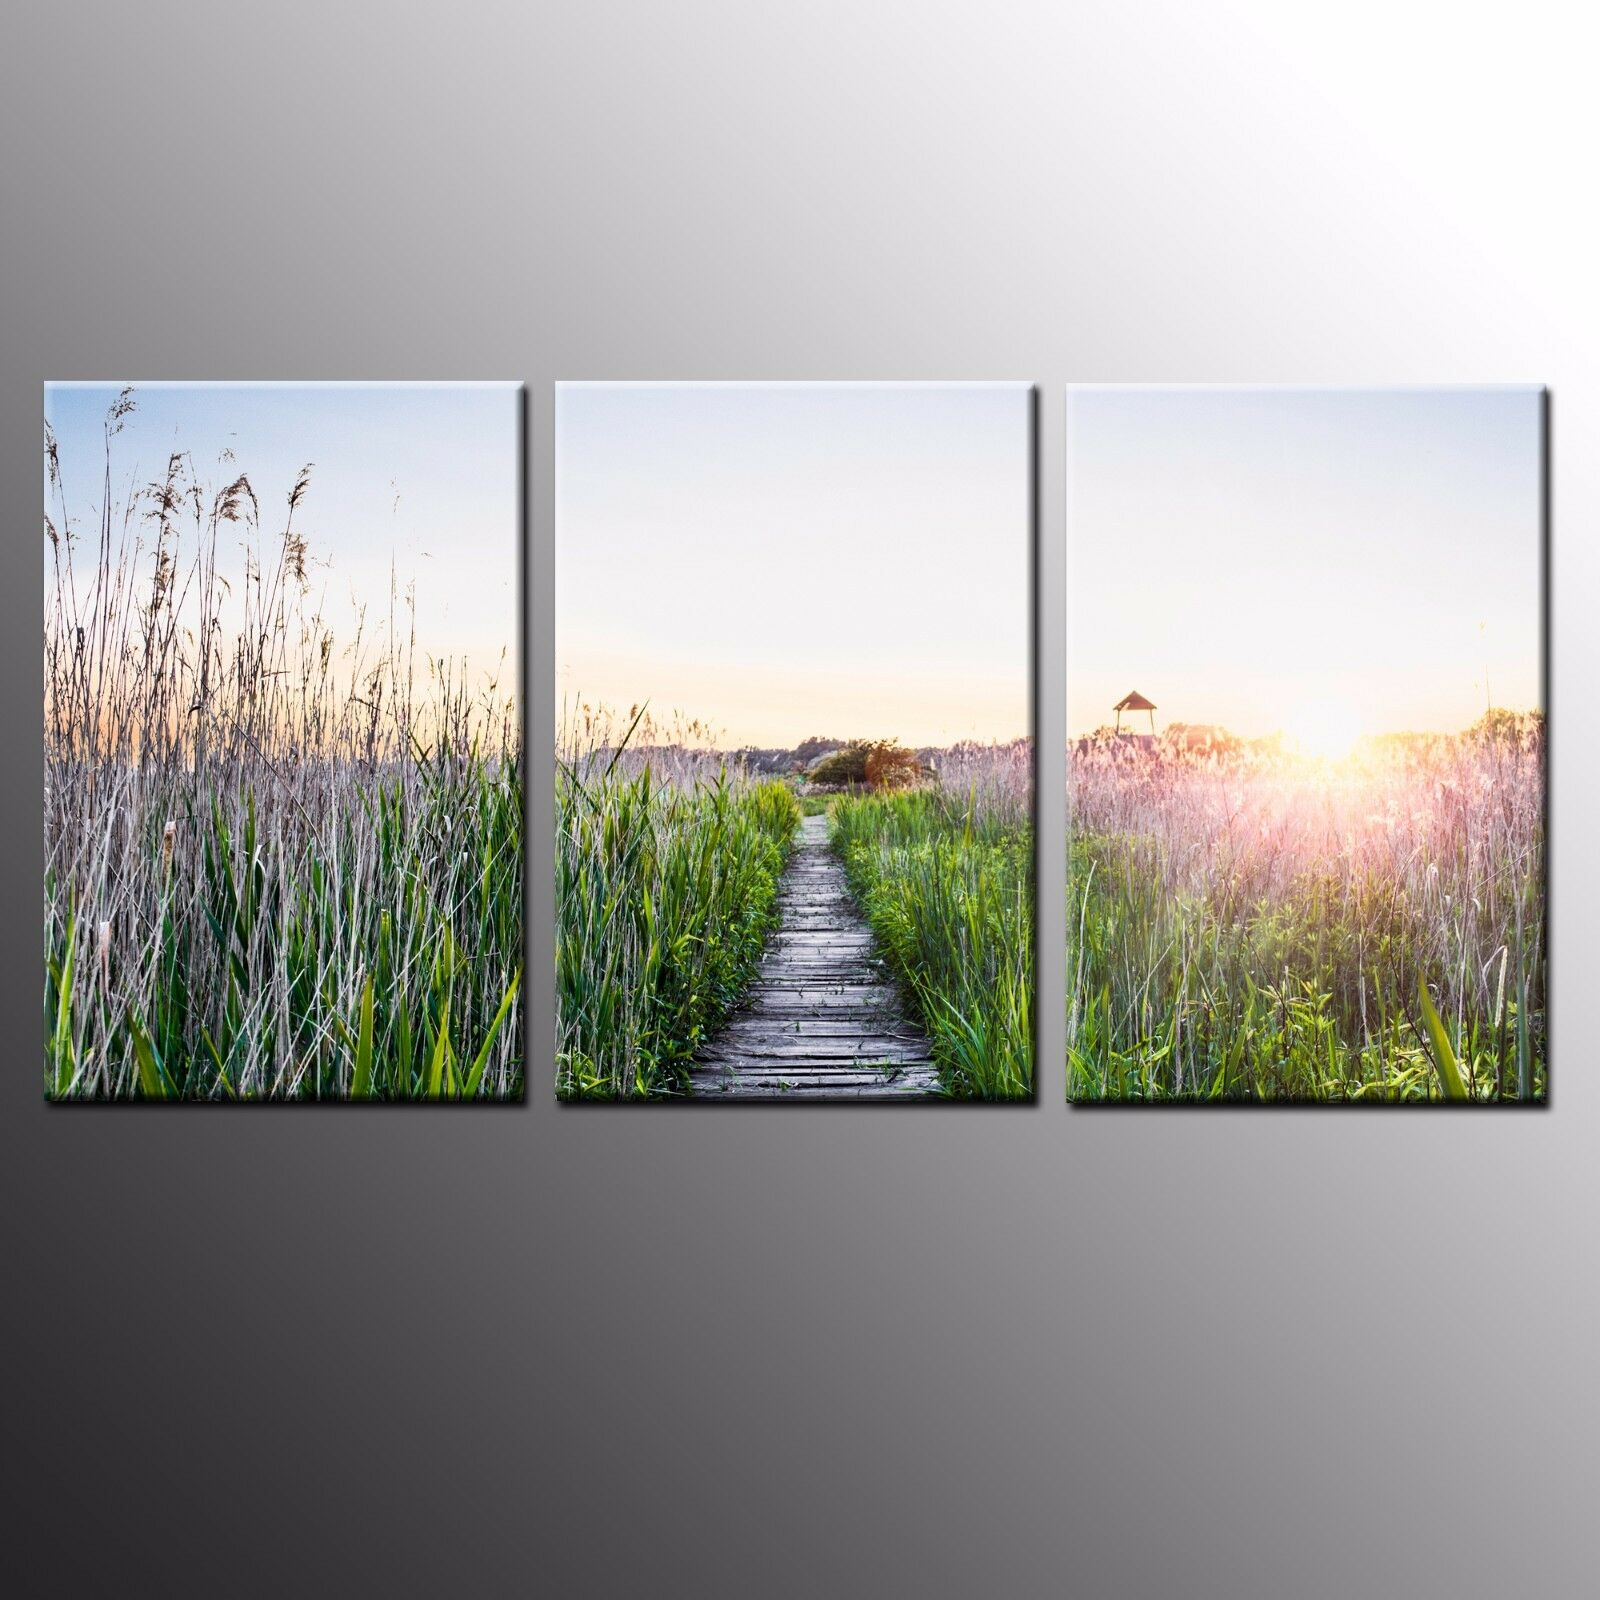 FRAMED HD Canvas Art Prints Wall Art Grass Path Home Printed Painting Art-3pcs